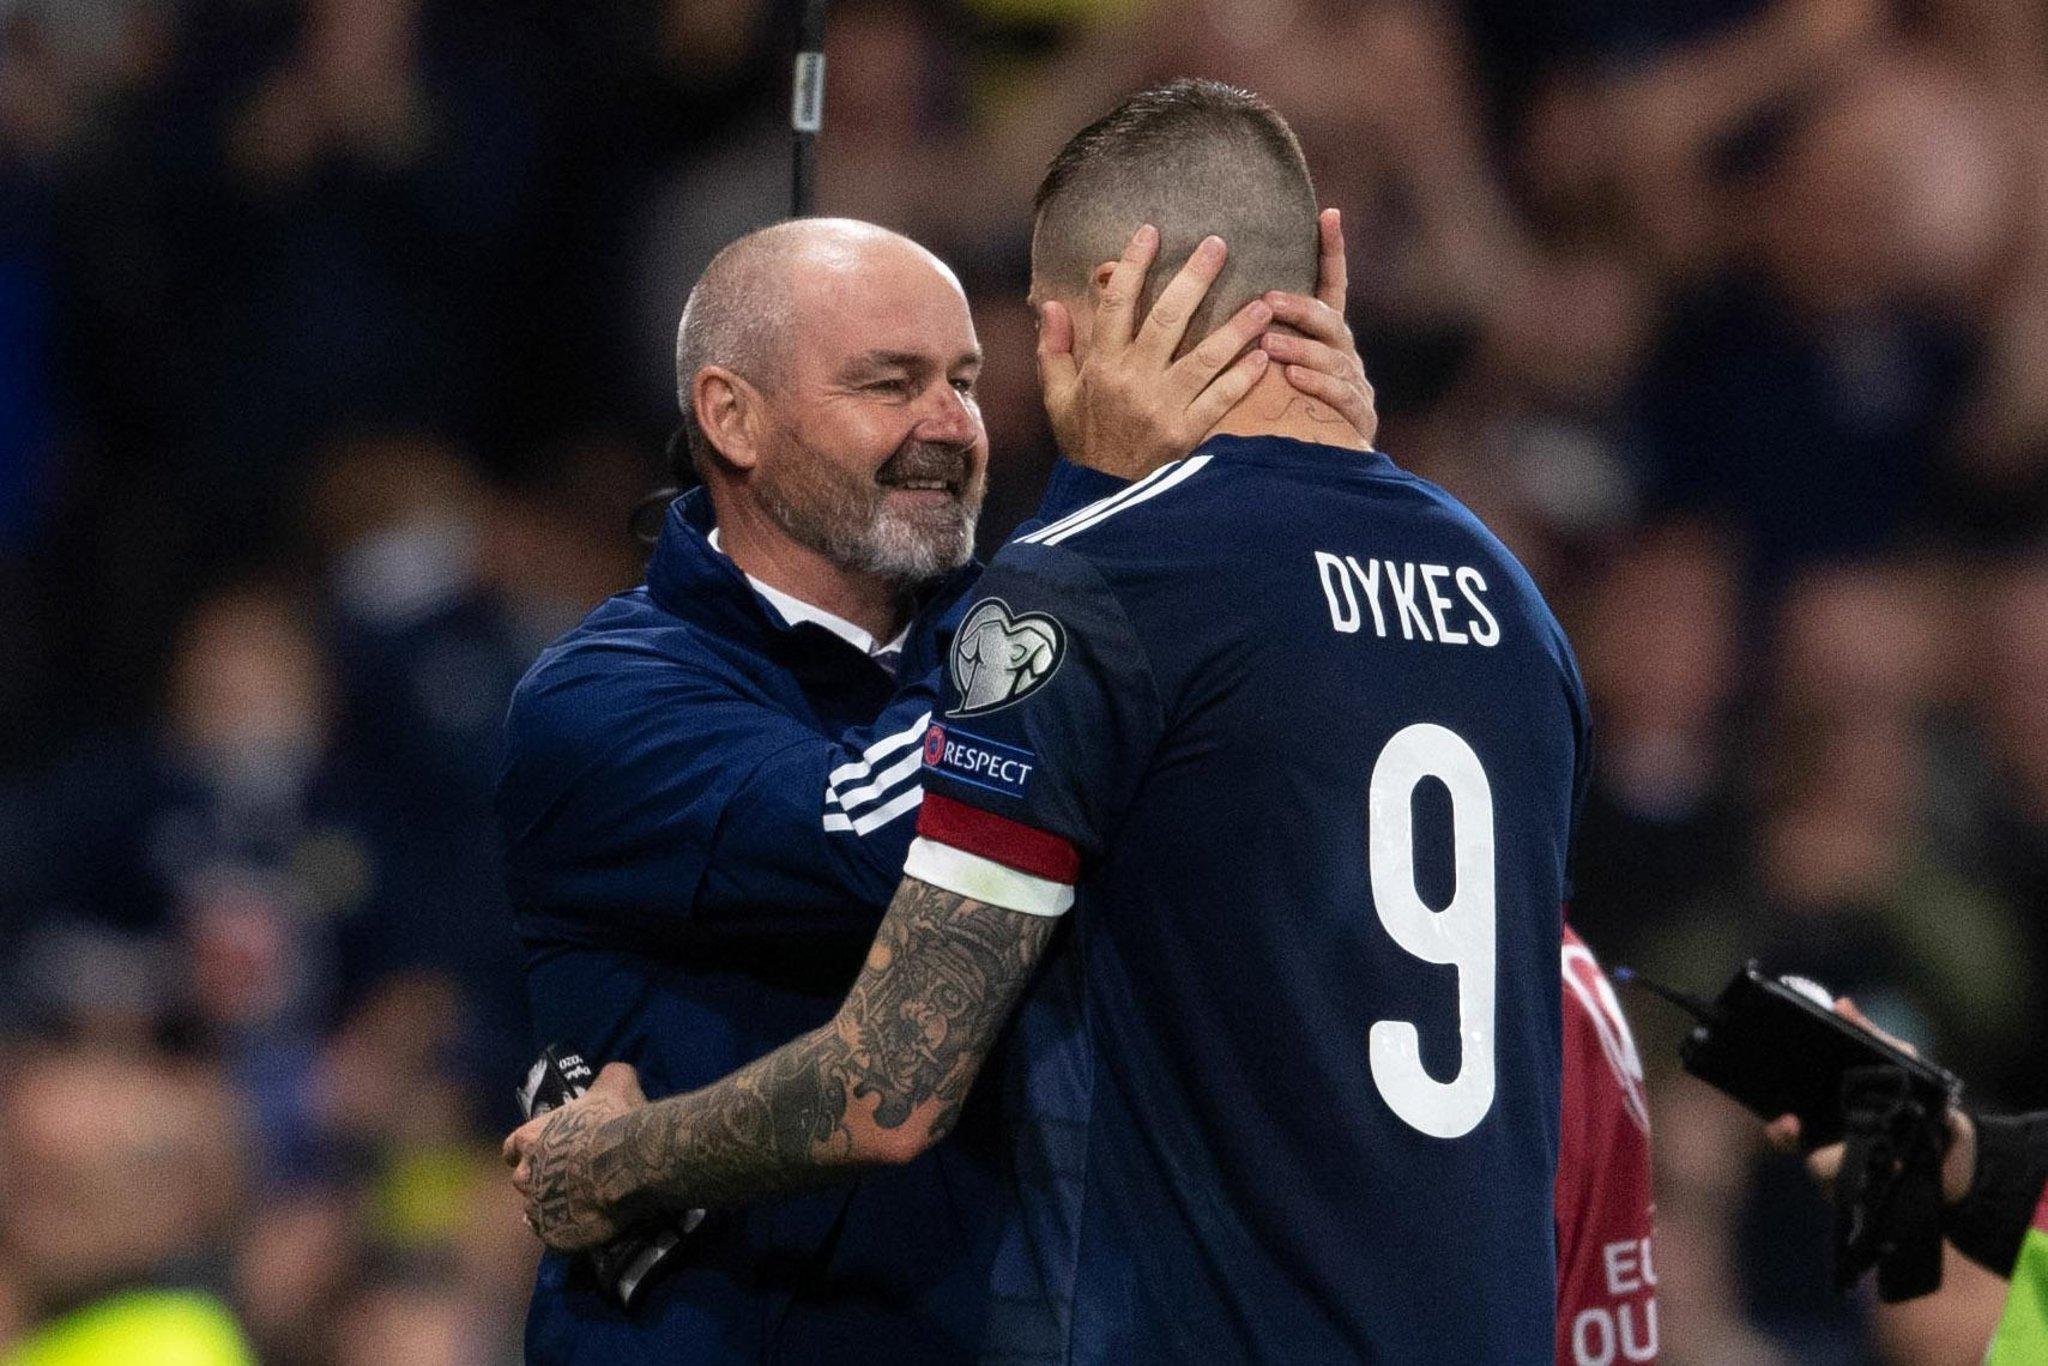 Steve Clarke mengungkapkan apakah Lyndon Dykes akan mengambil penalti Skotlandia berikutnya setelah Israel gagal